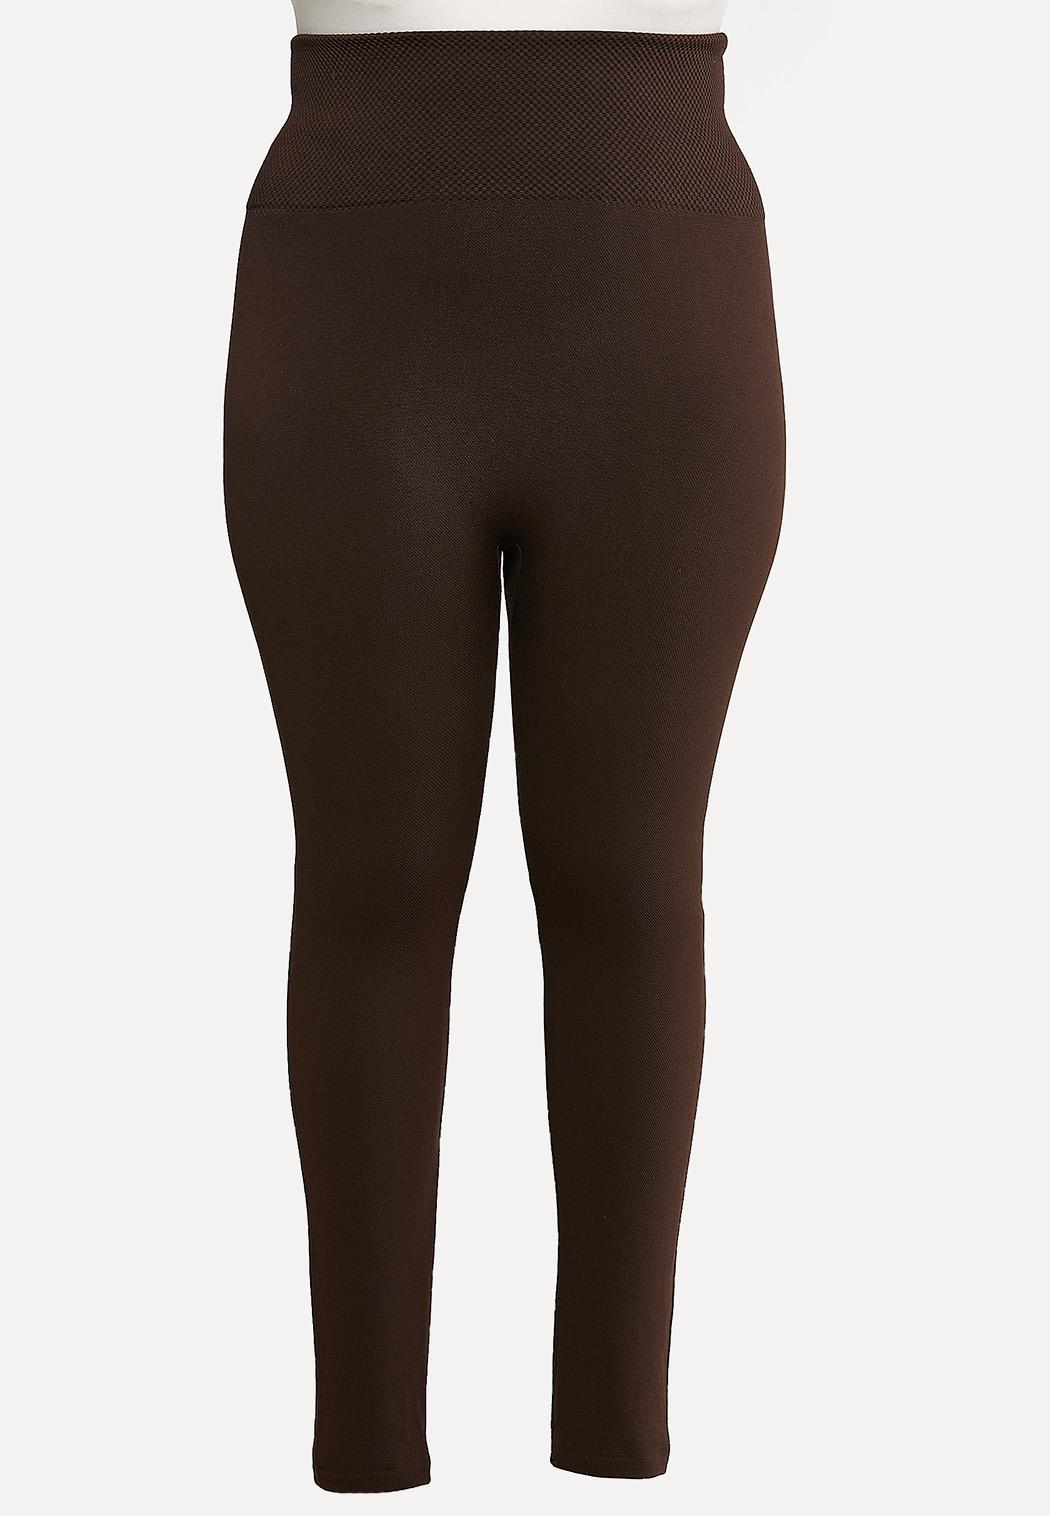 Plus Size Solid Fleece Leggings